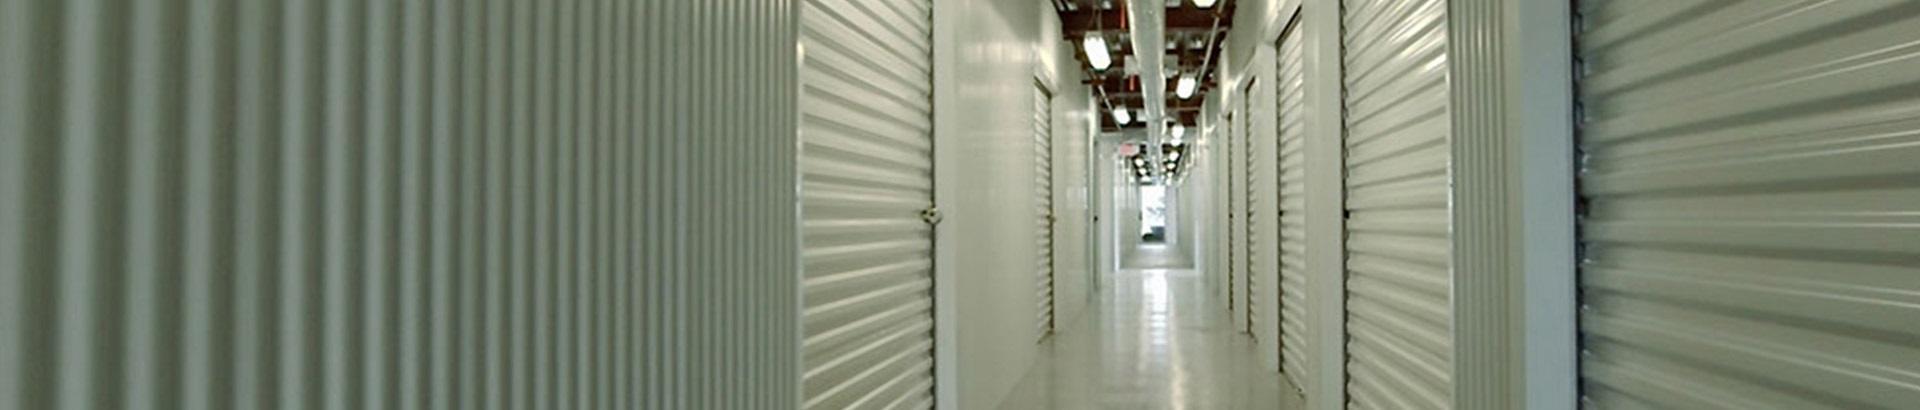 Secured Climate Storage image 0